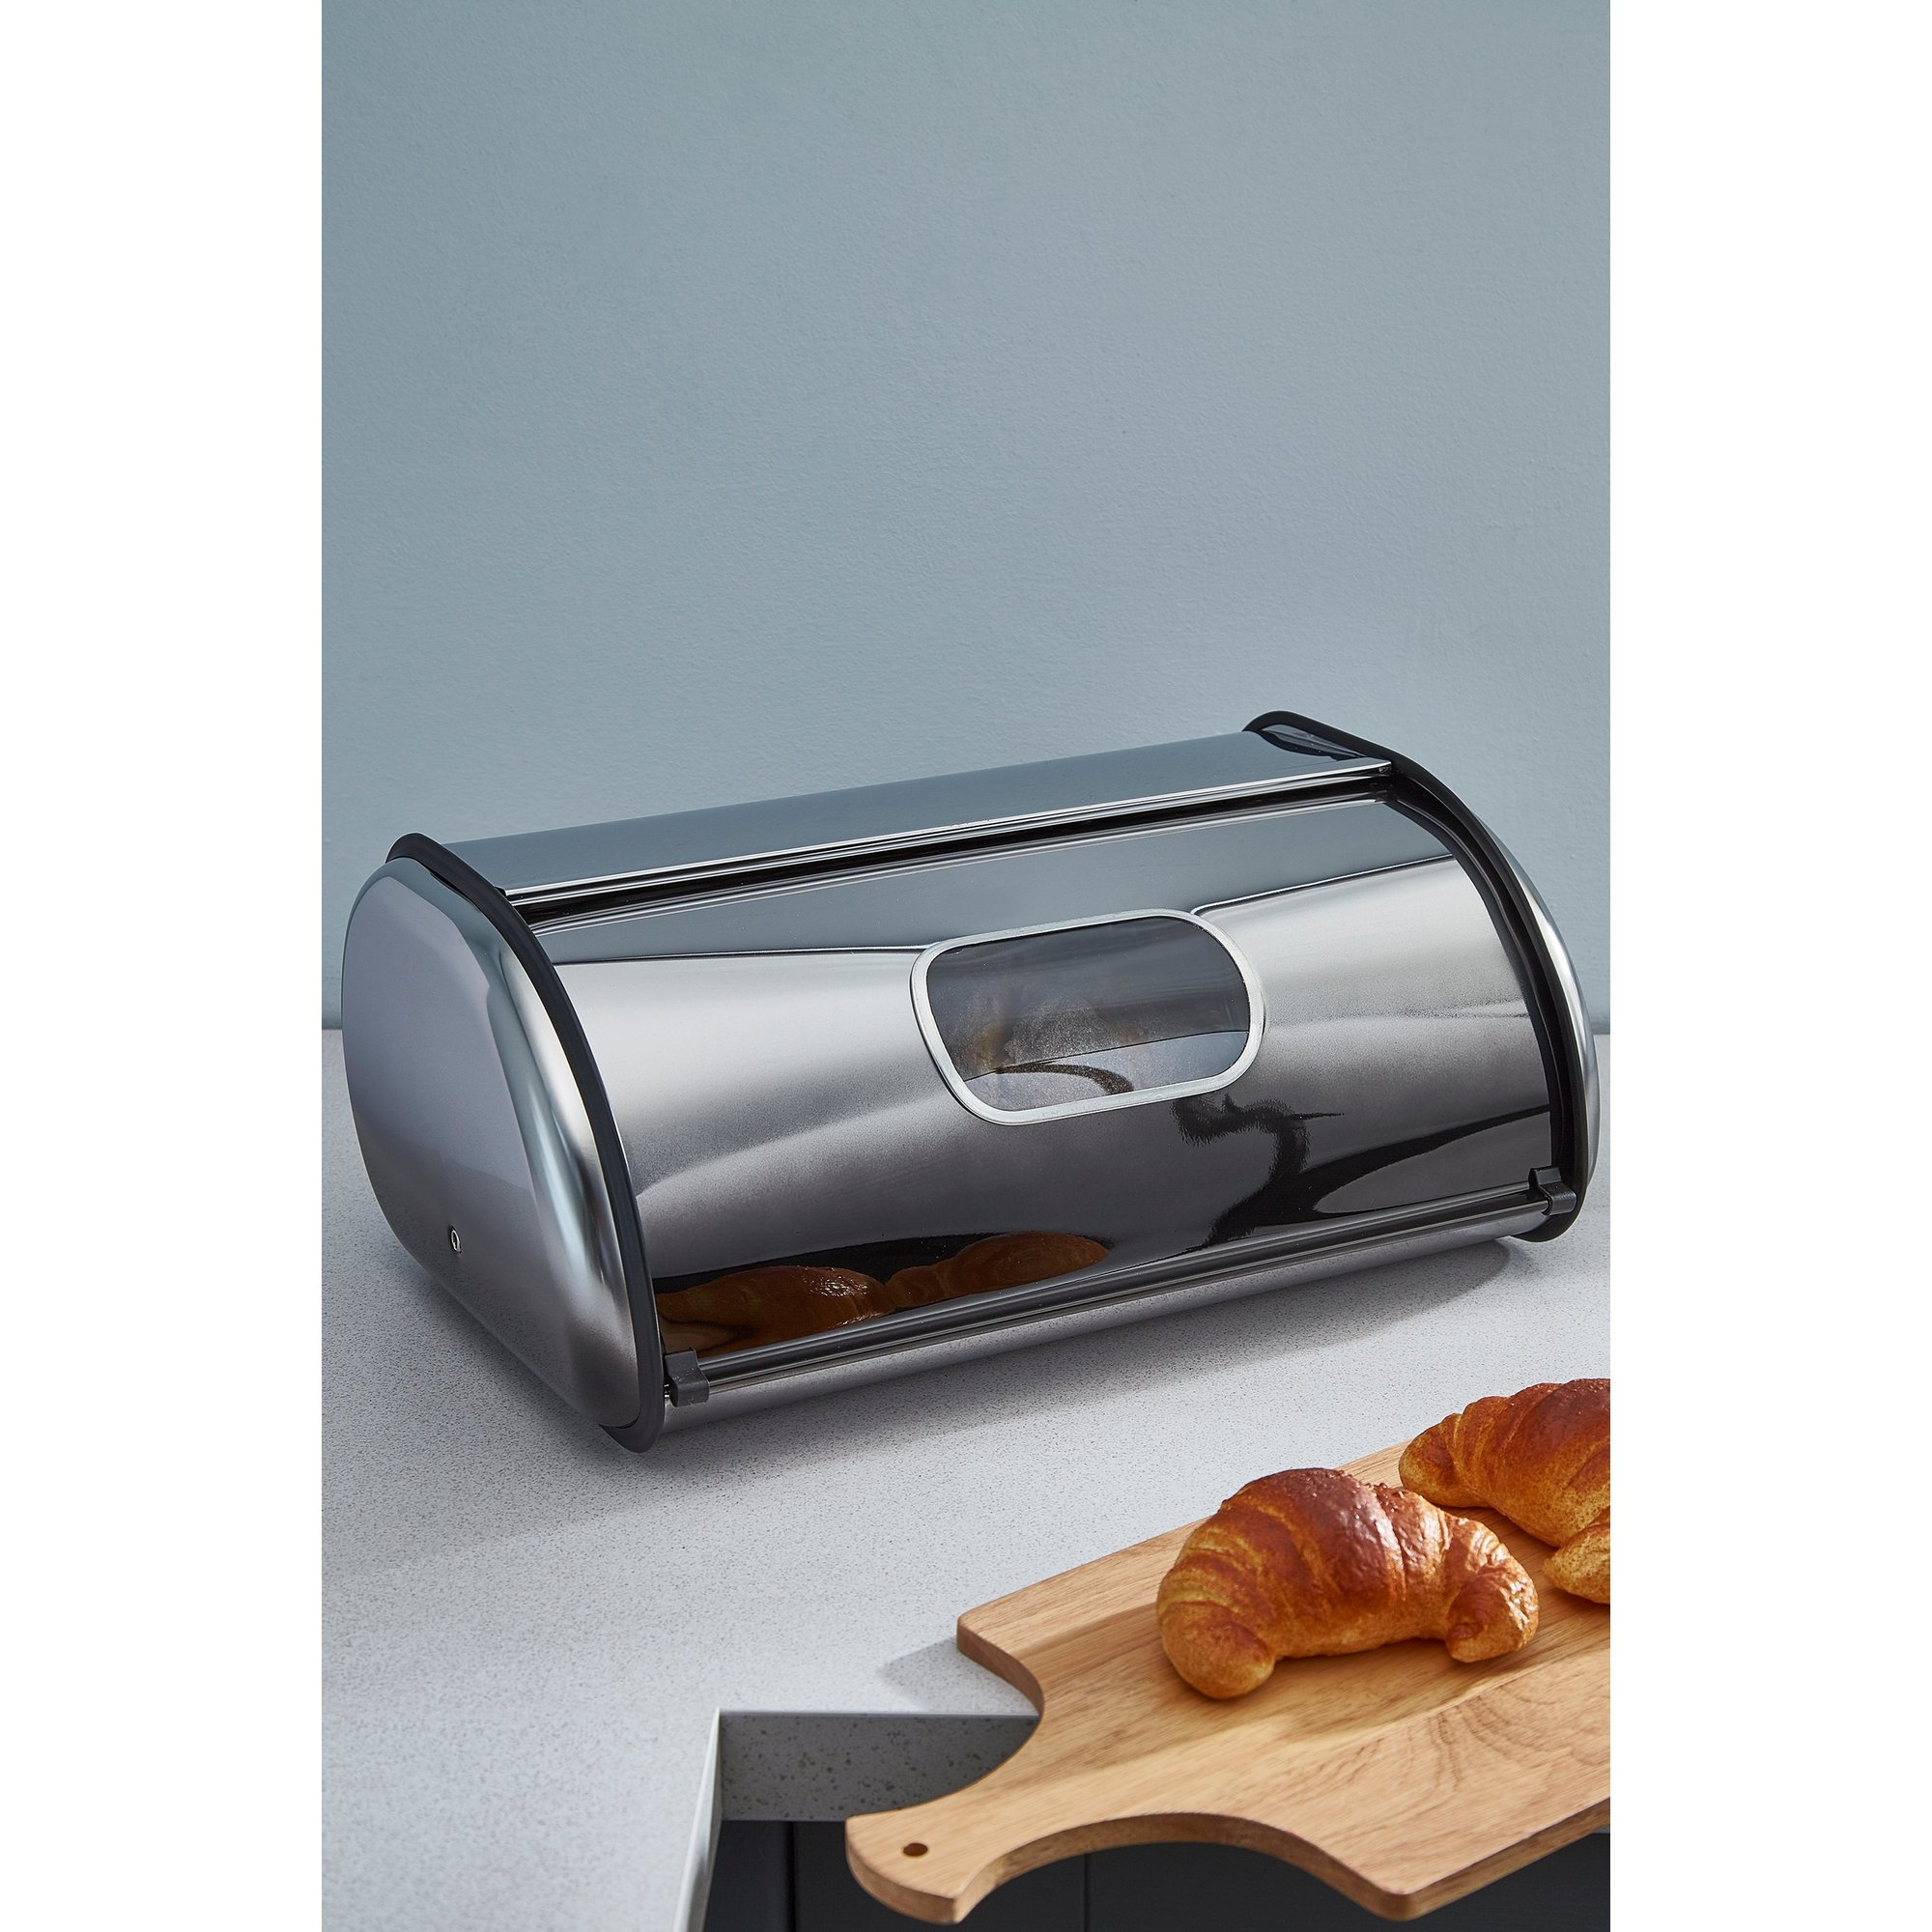 Image of Daewoo Callisto Ombre Bread Bin